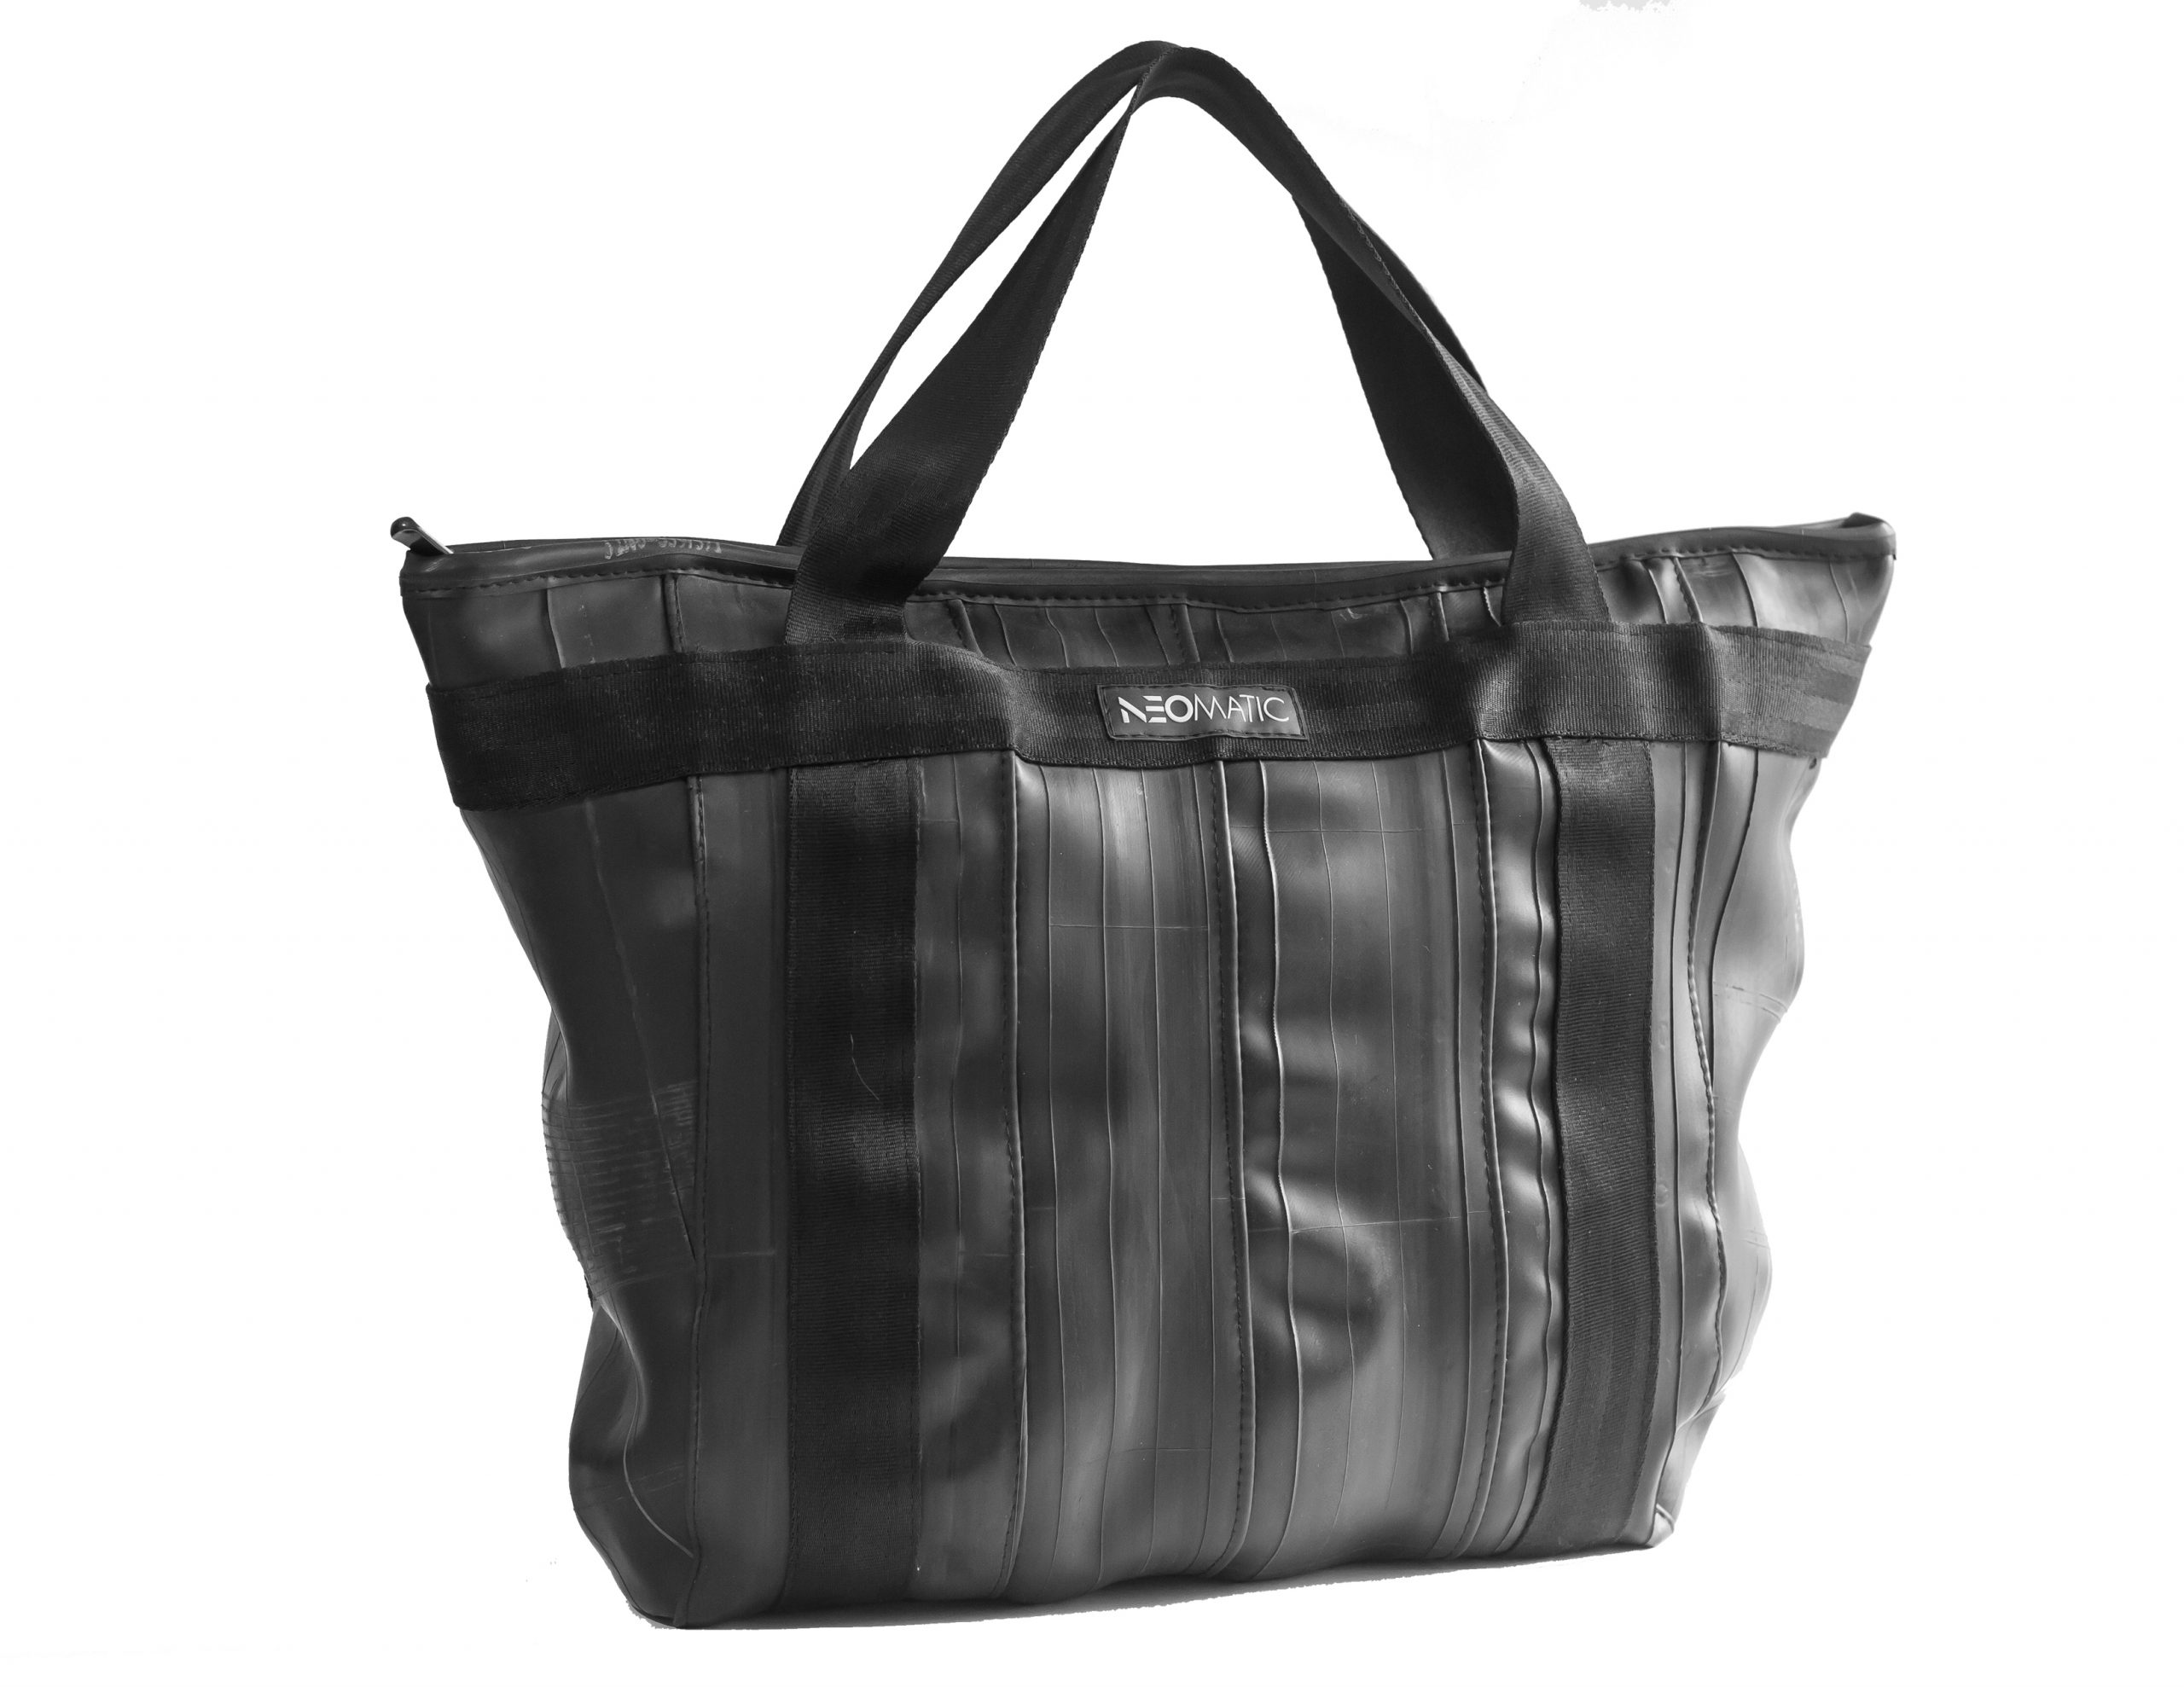 NeoMatic Opal Tote women urban bag